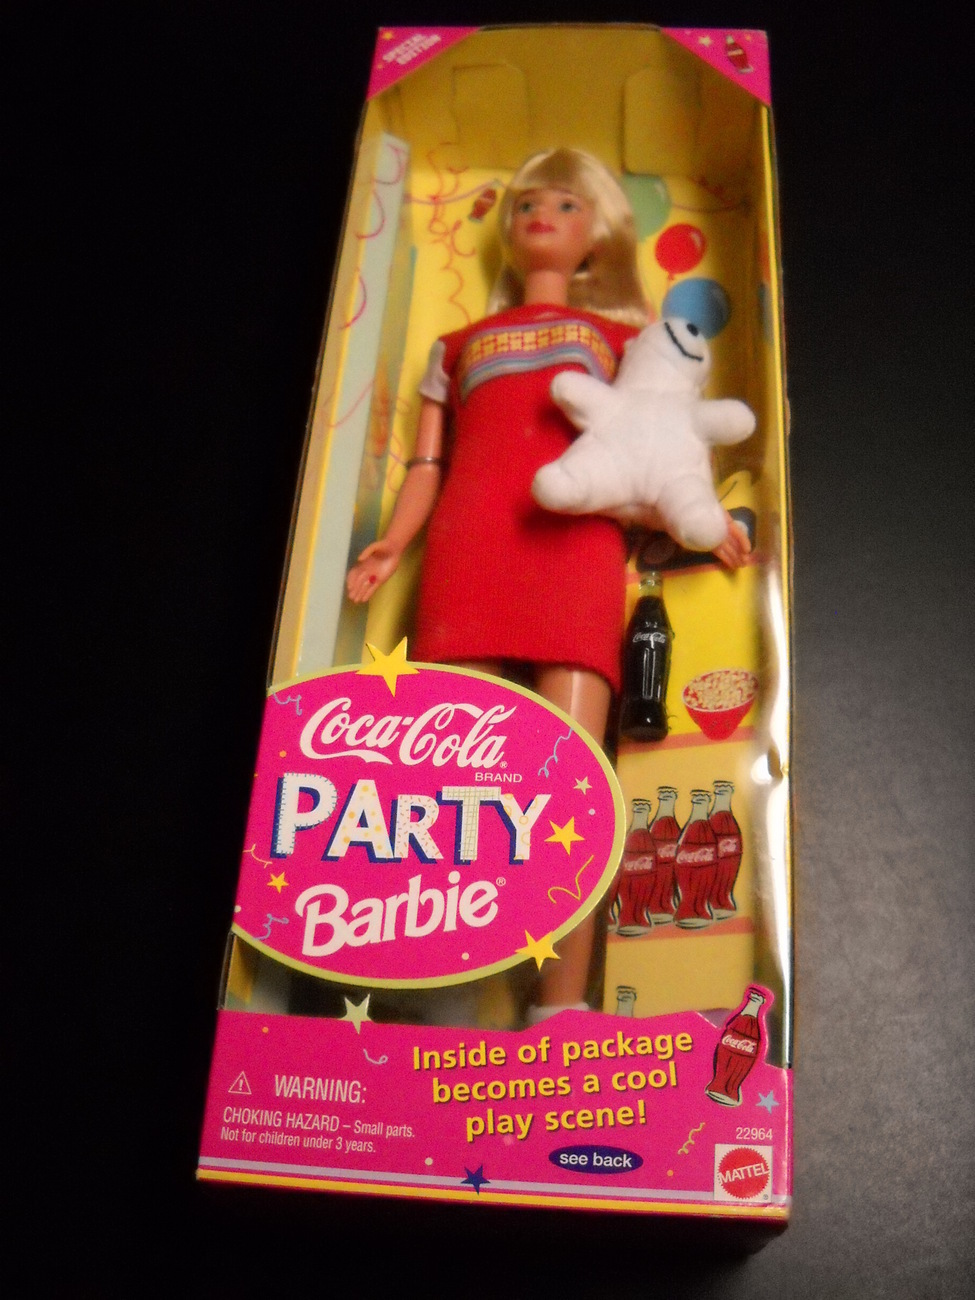 Barbie Coca Cola Party Barbie 1998 Mattel Cool Play Scene and Bear in Sealed Box Mattel, Mattel Barbie